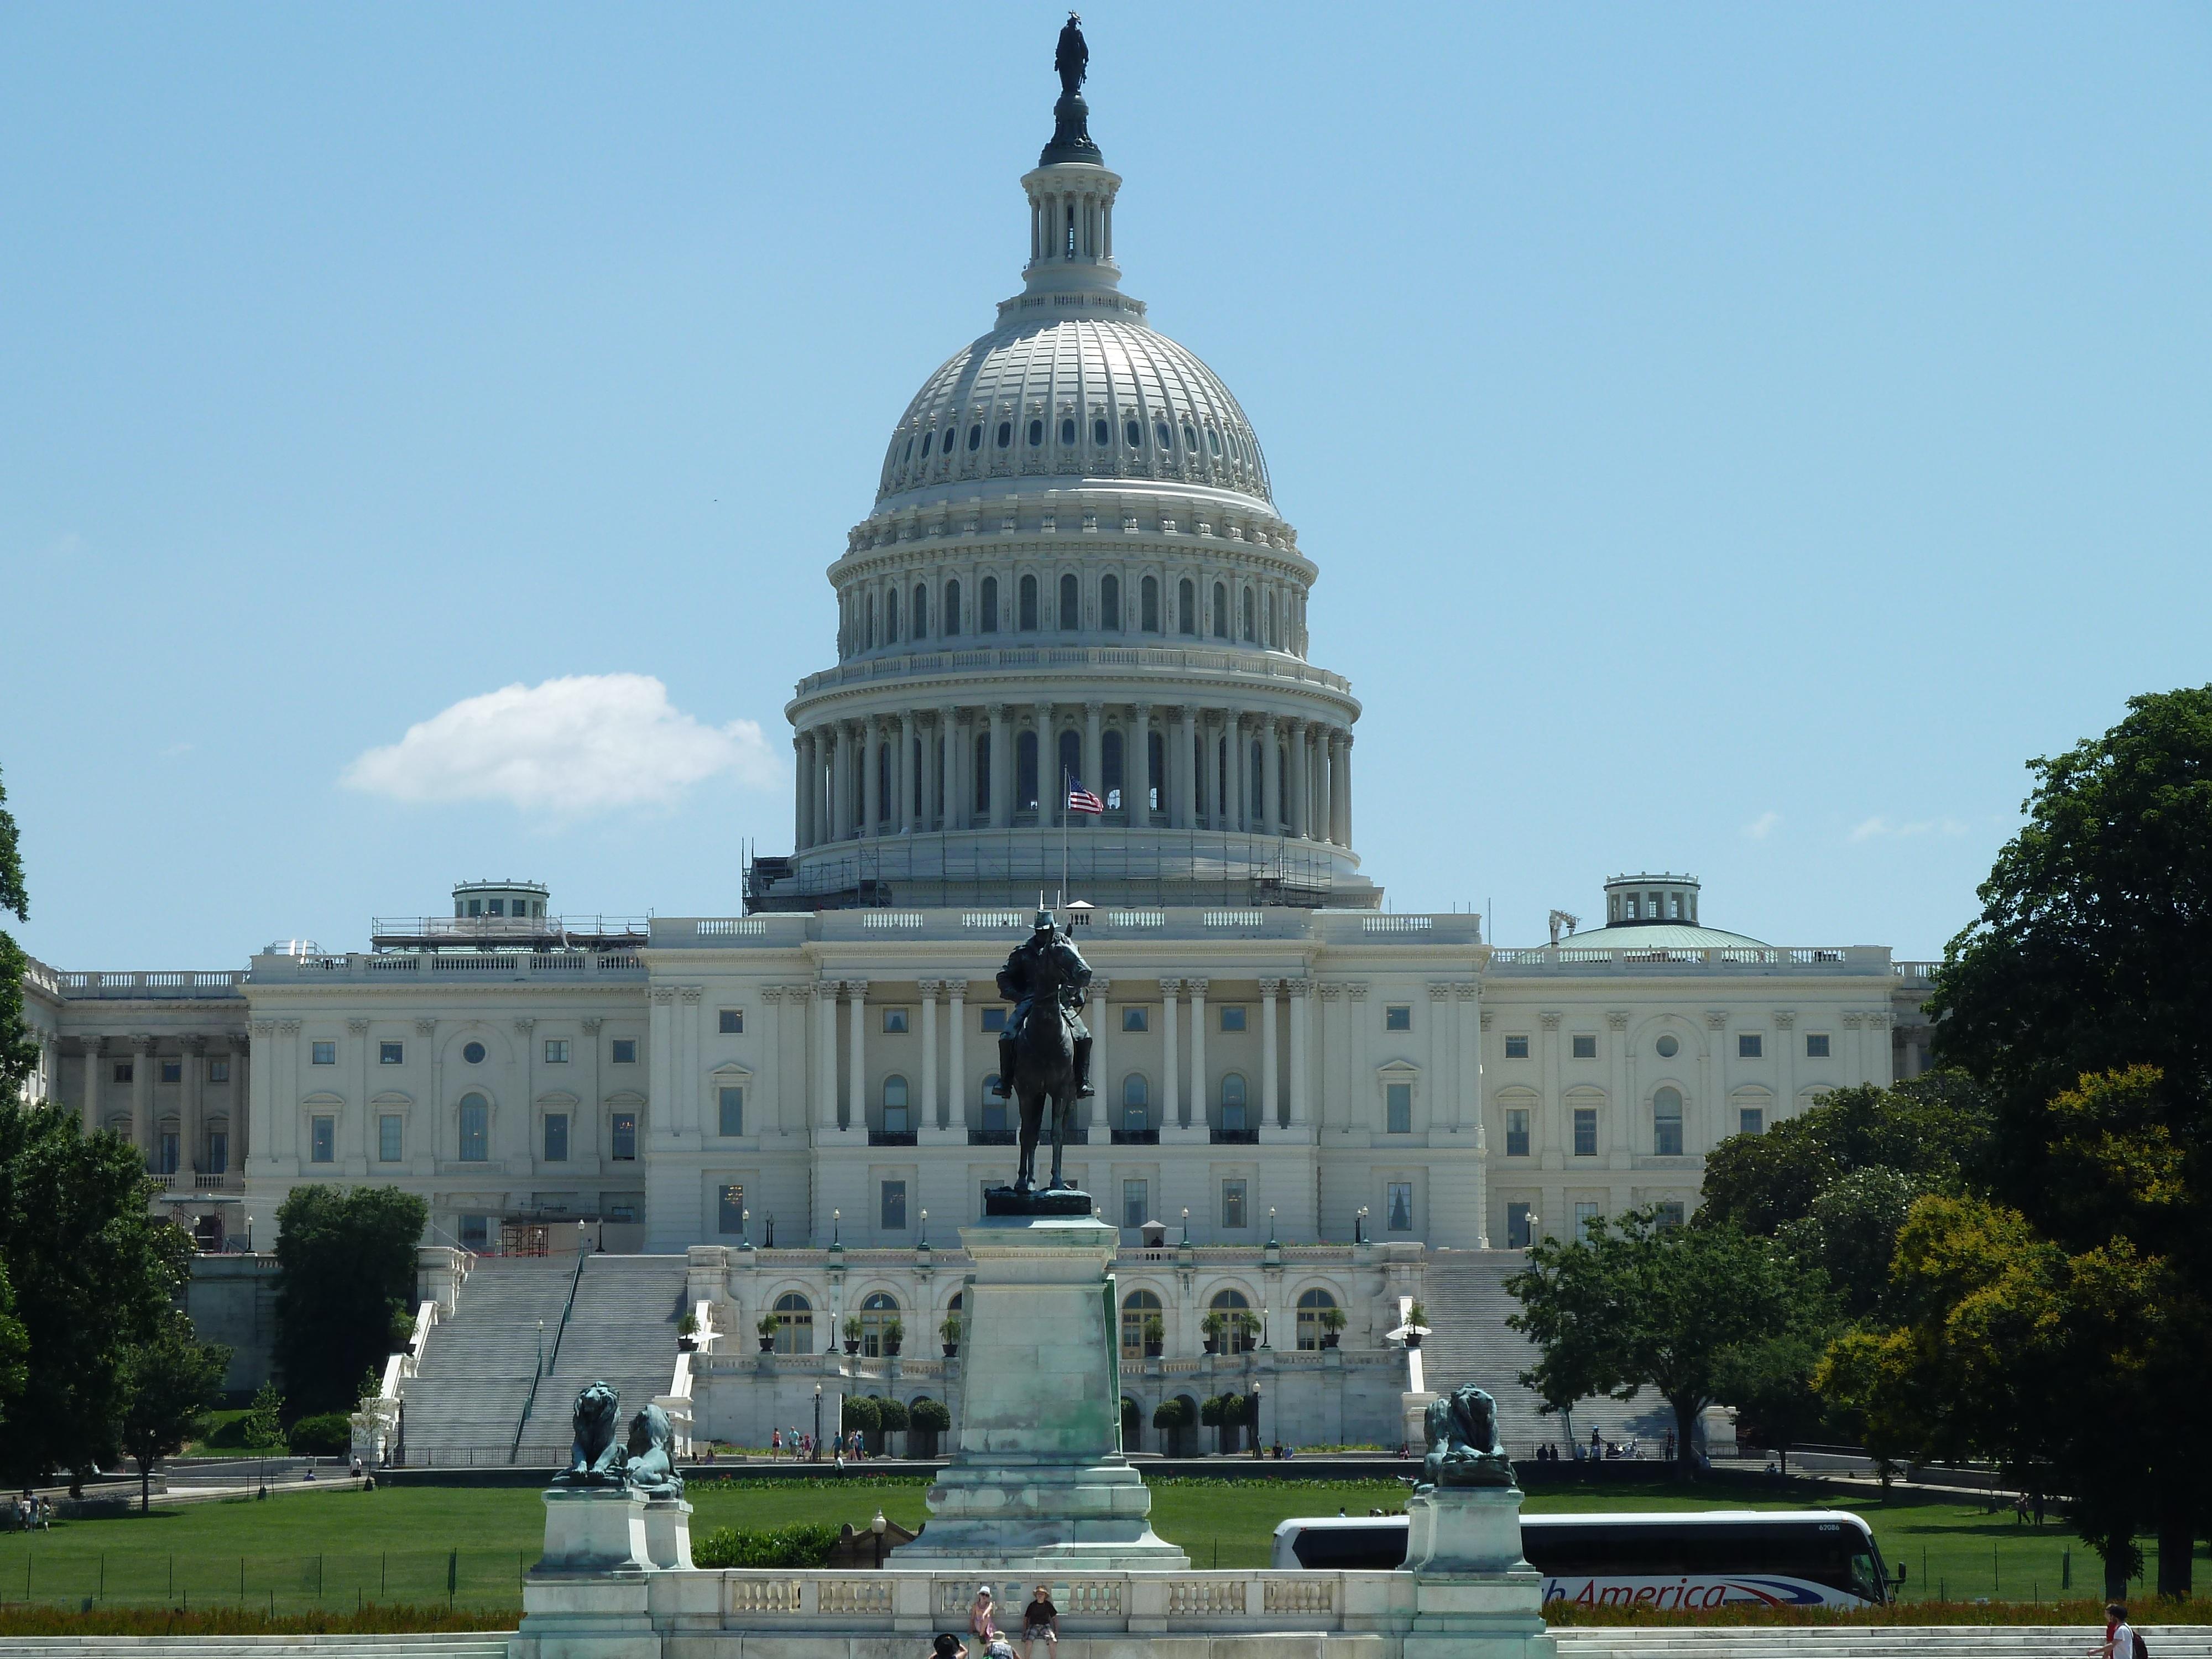 Landscape view of the U.S. Capitol building.